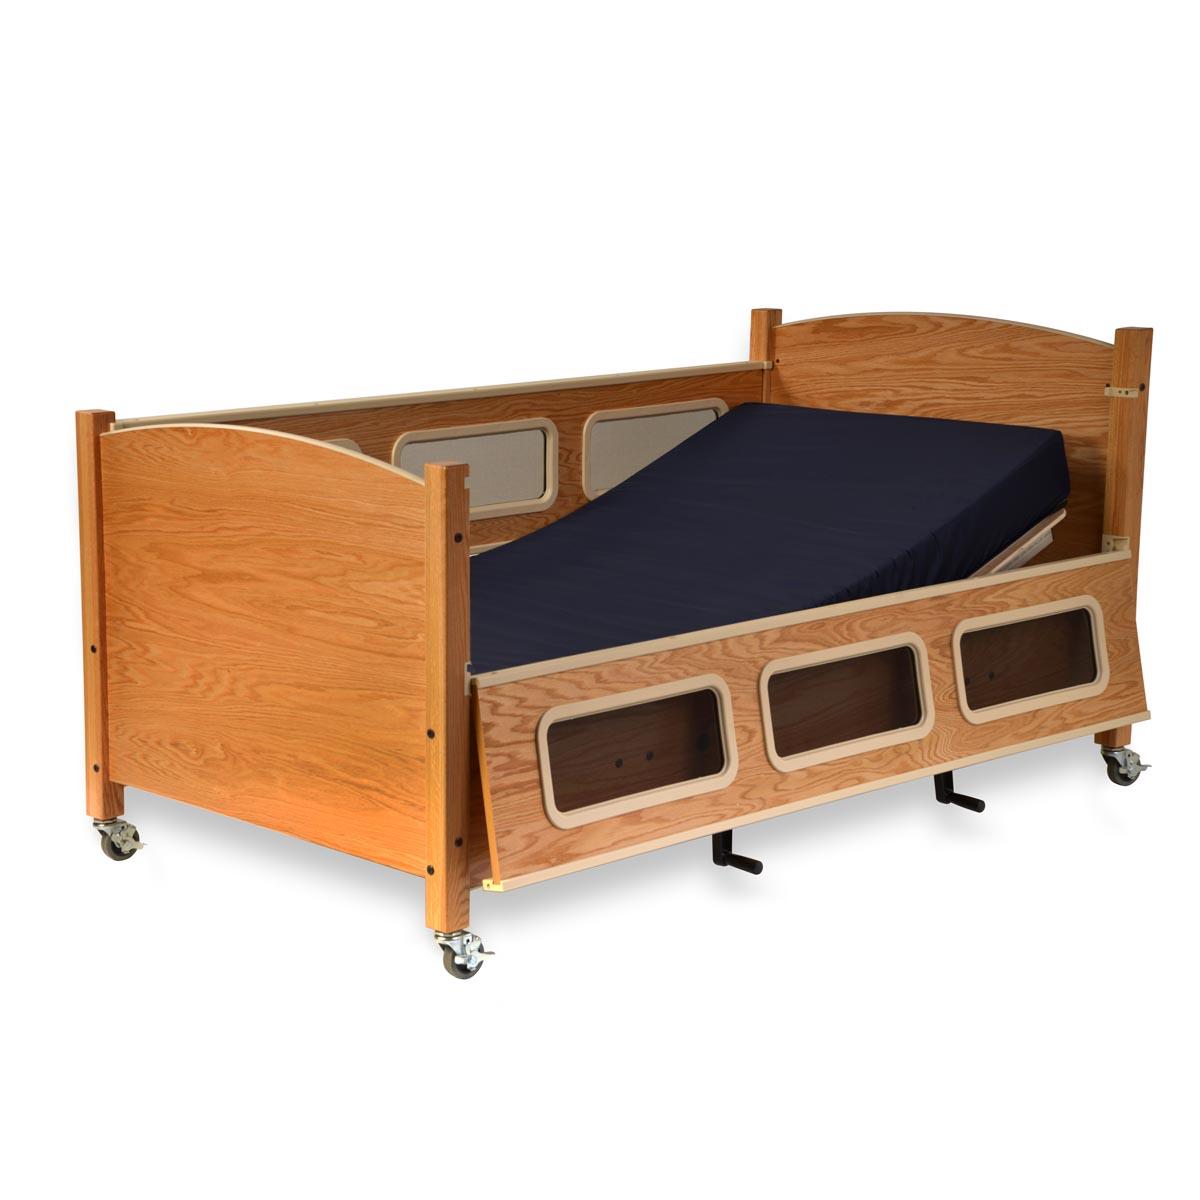 SleepSafe electric low bed - hi-lo